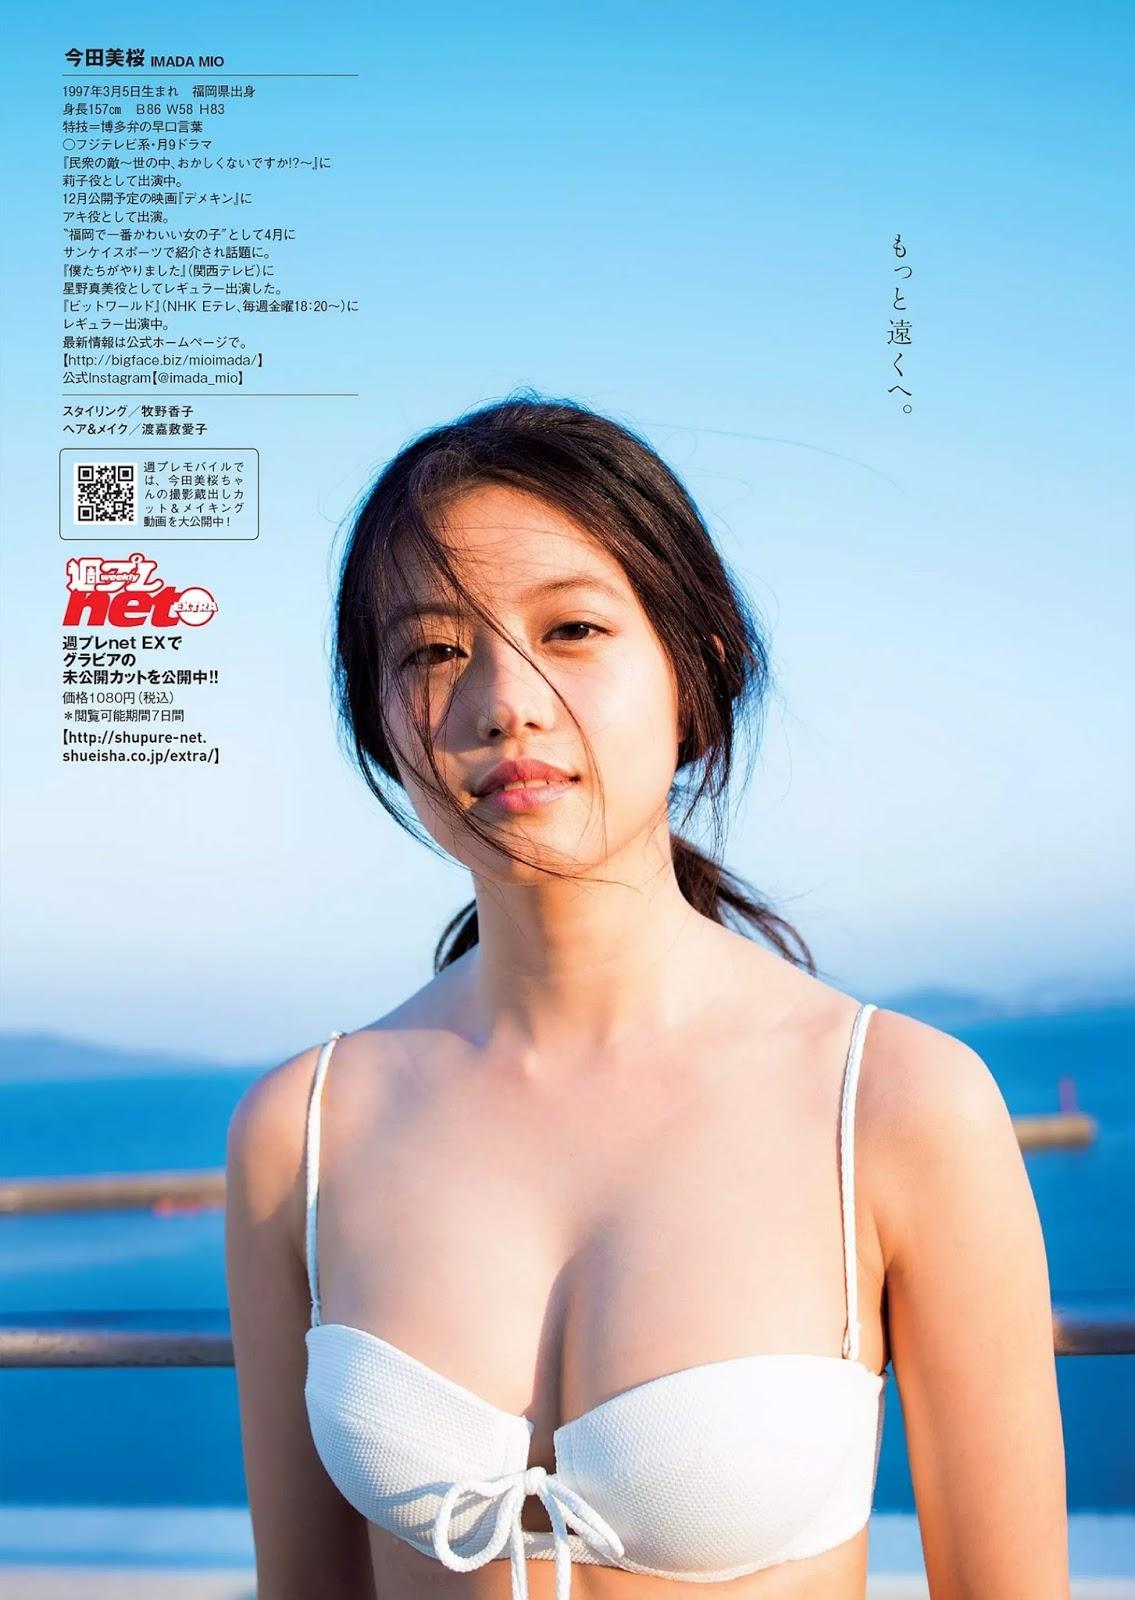 Mio Imada 今田美桜, Weekly Playboy 2017 No.46 (週刊プレイボーイ 2017年46号)